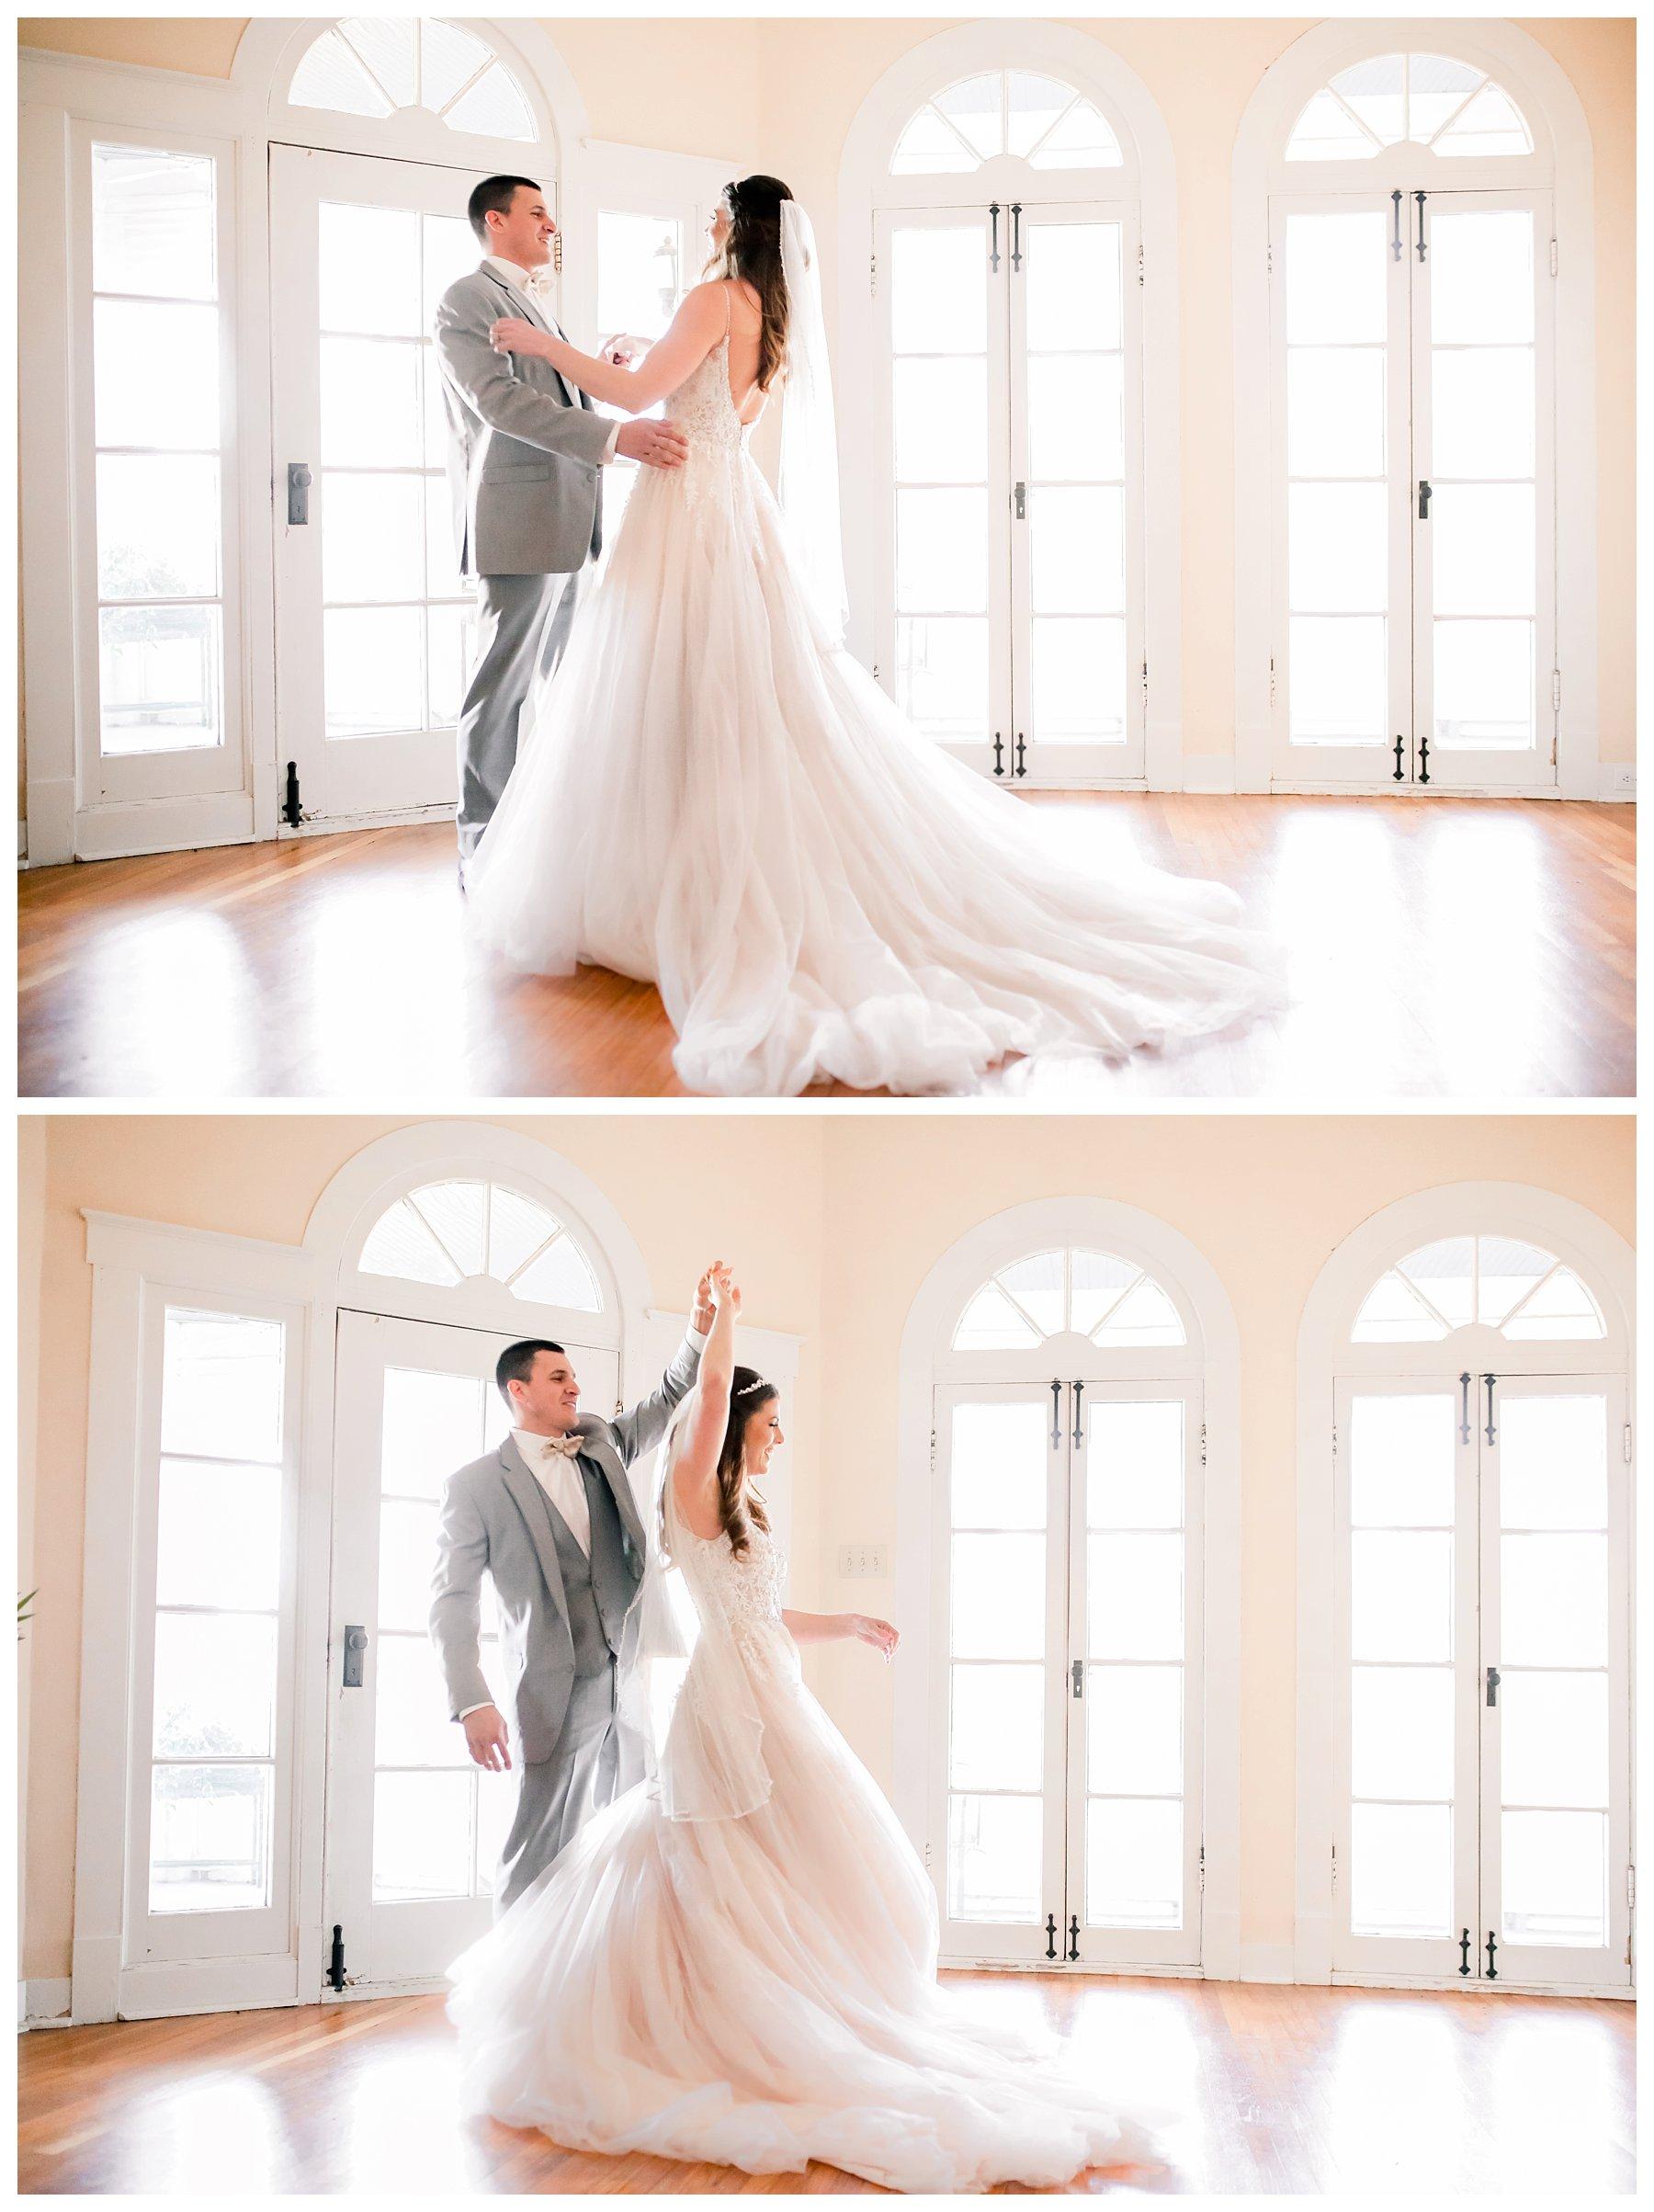 photographer_wedding_saint_louis_Kansas_City_Photography_Videography_workshop_training_styled_engagement_Lake_Ozark_KC_MO_STL_Rolla_Hermann_Saint_James_0371.jpg